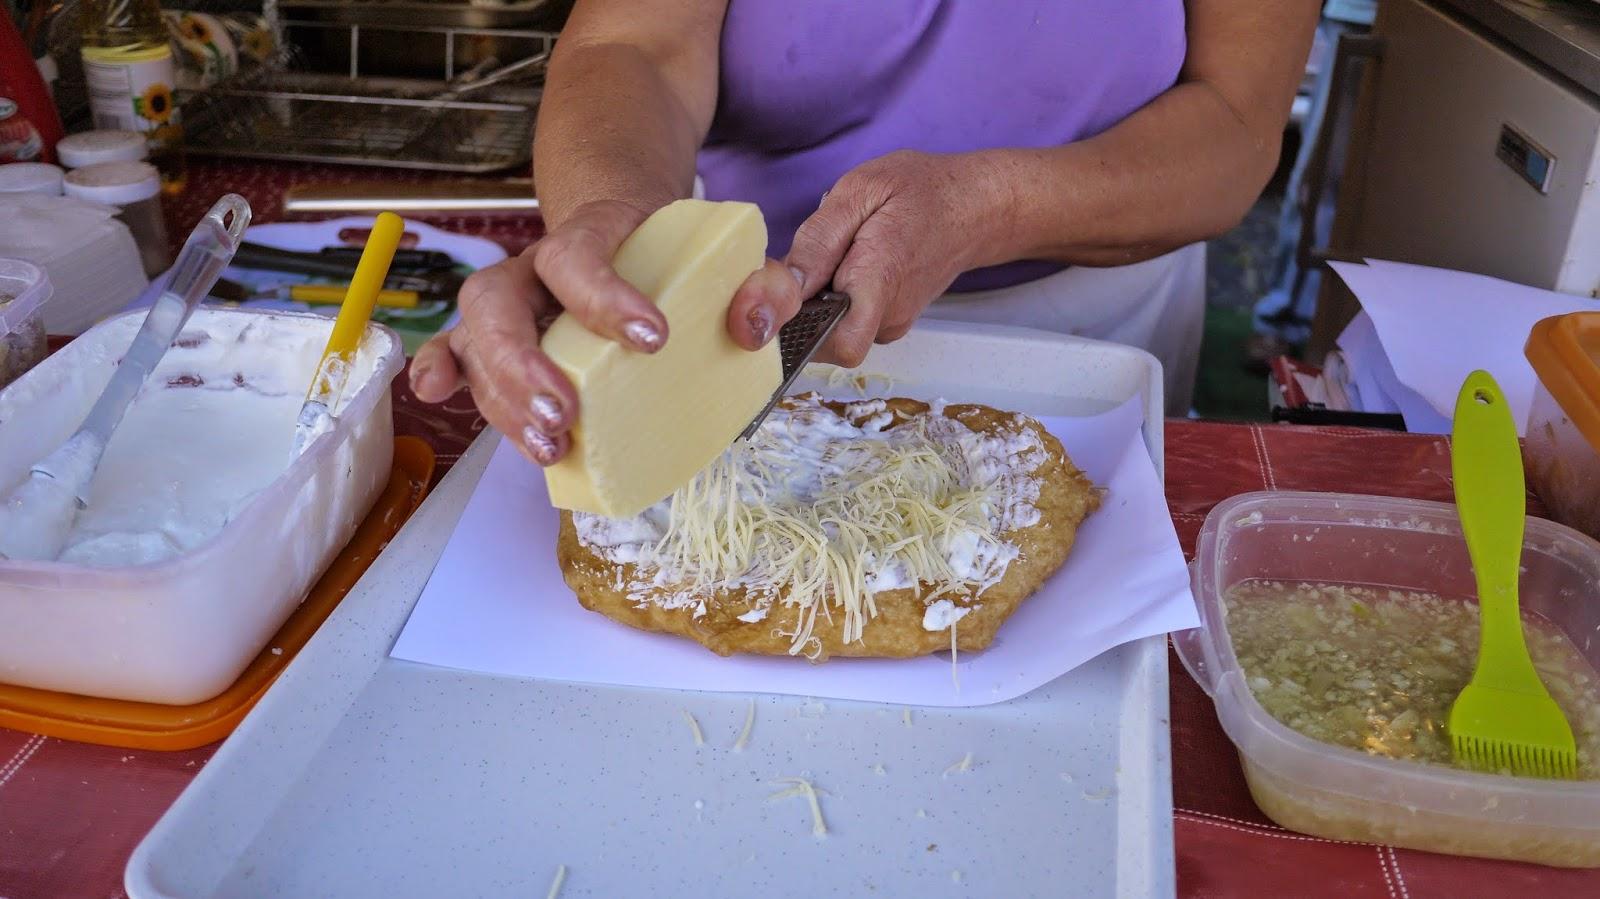 Making Langos in Budapest Hungary